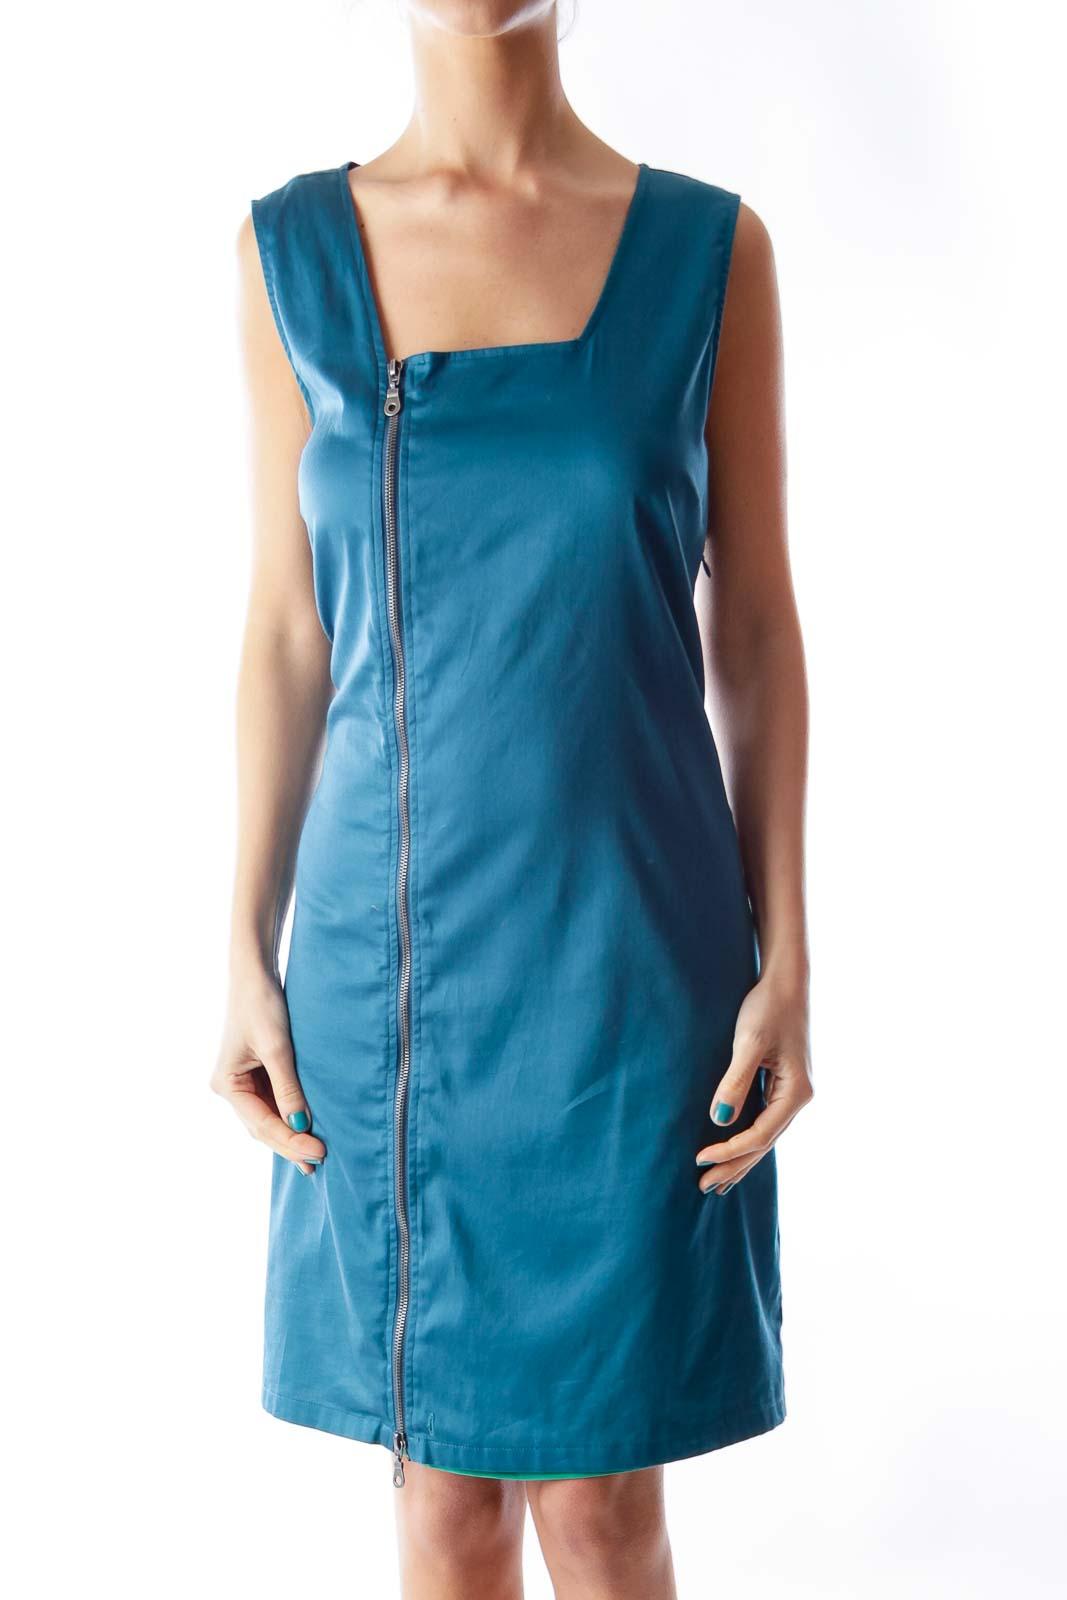 Blue Side Zipper Dress Front